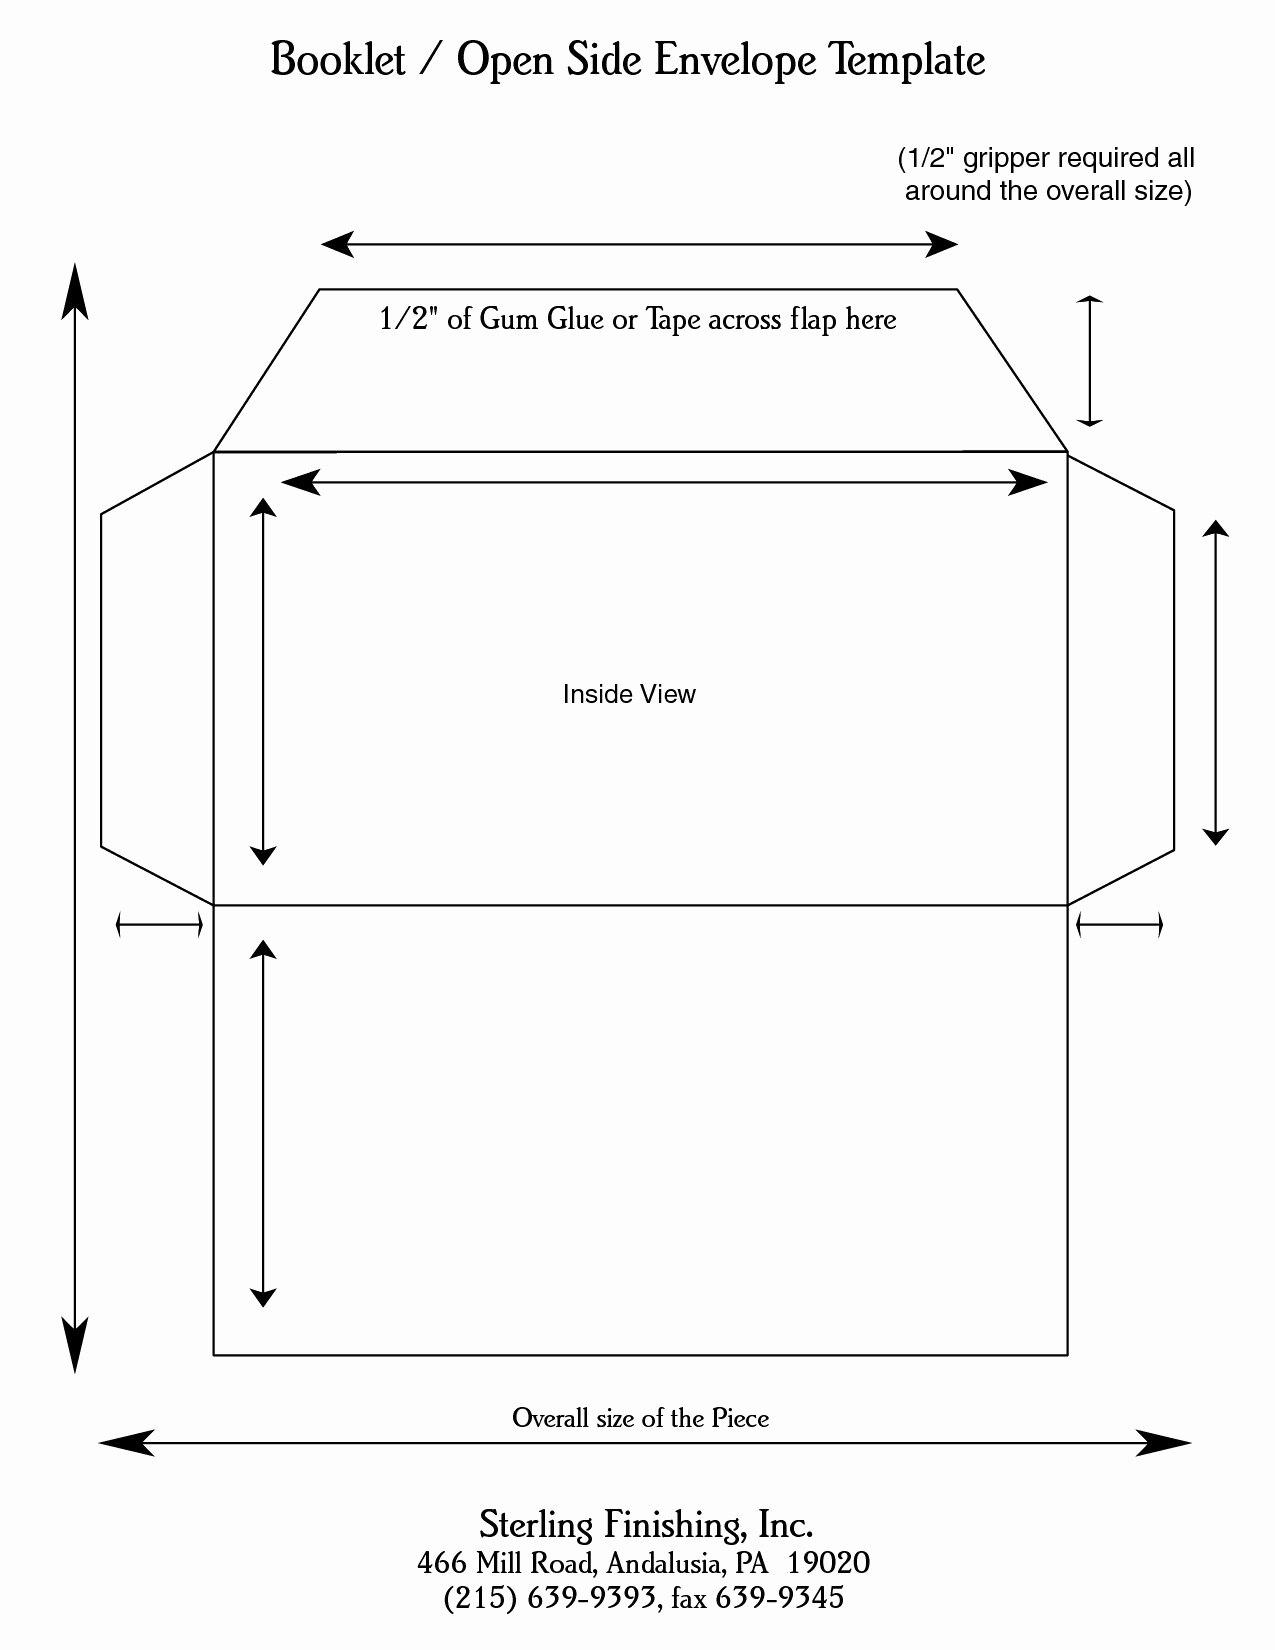 Elegant Standard Business Card Template Illustrator Throughout Business Envelope Template Illustrator